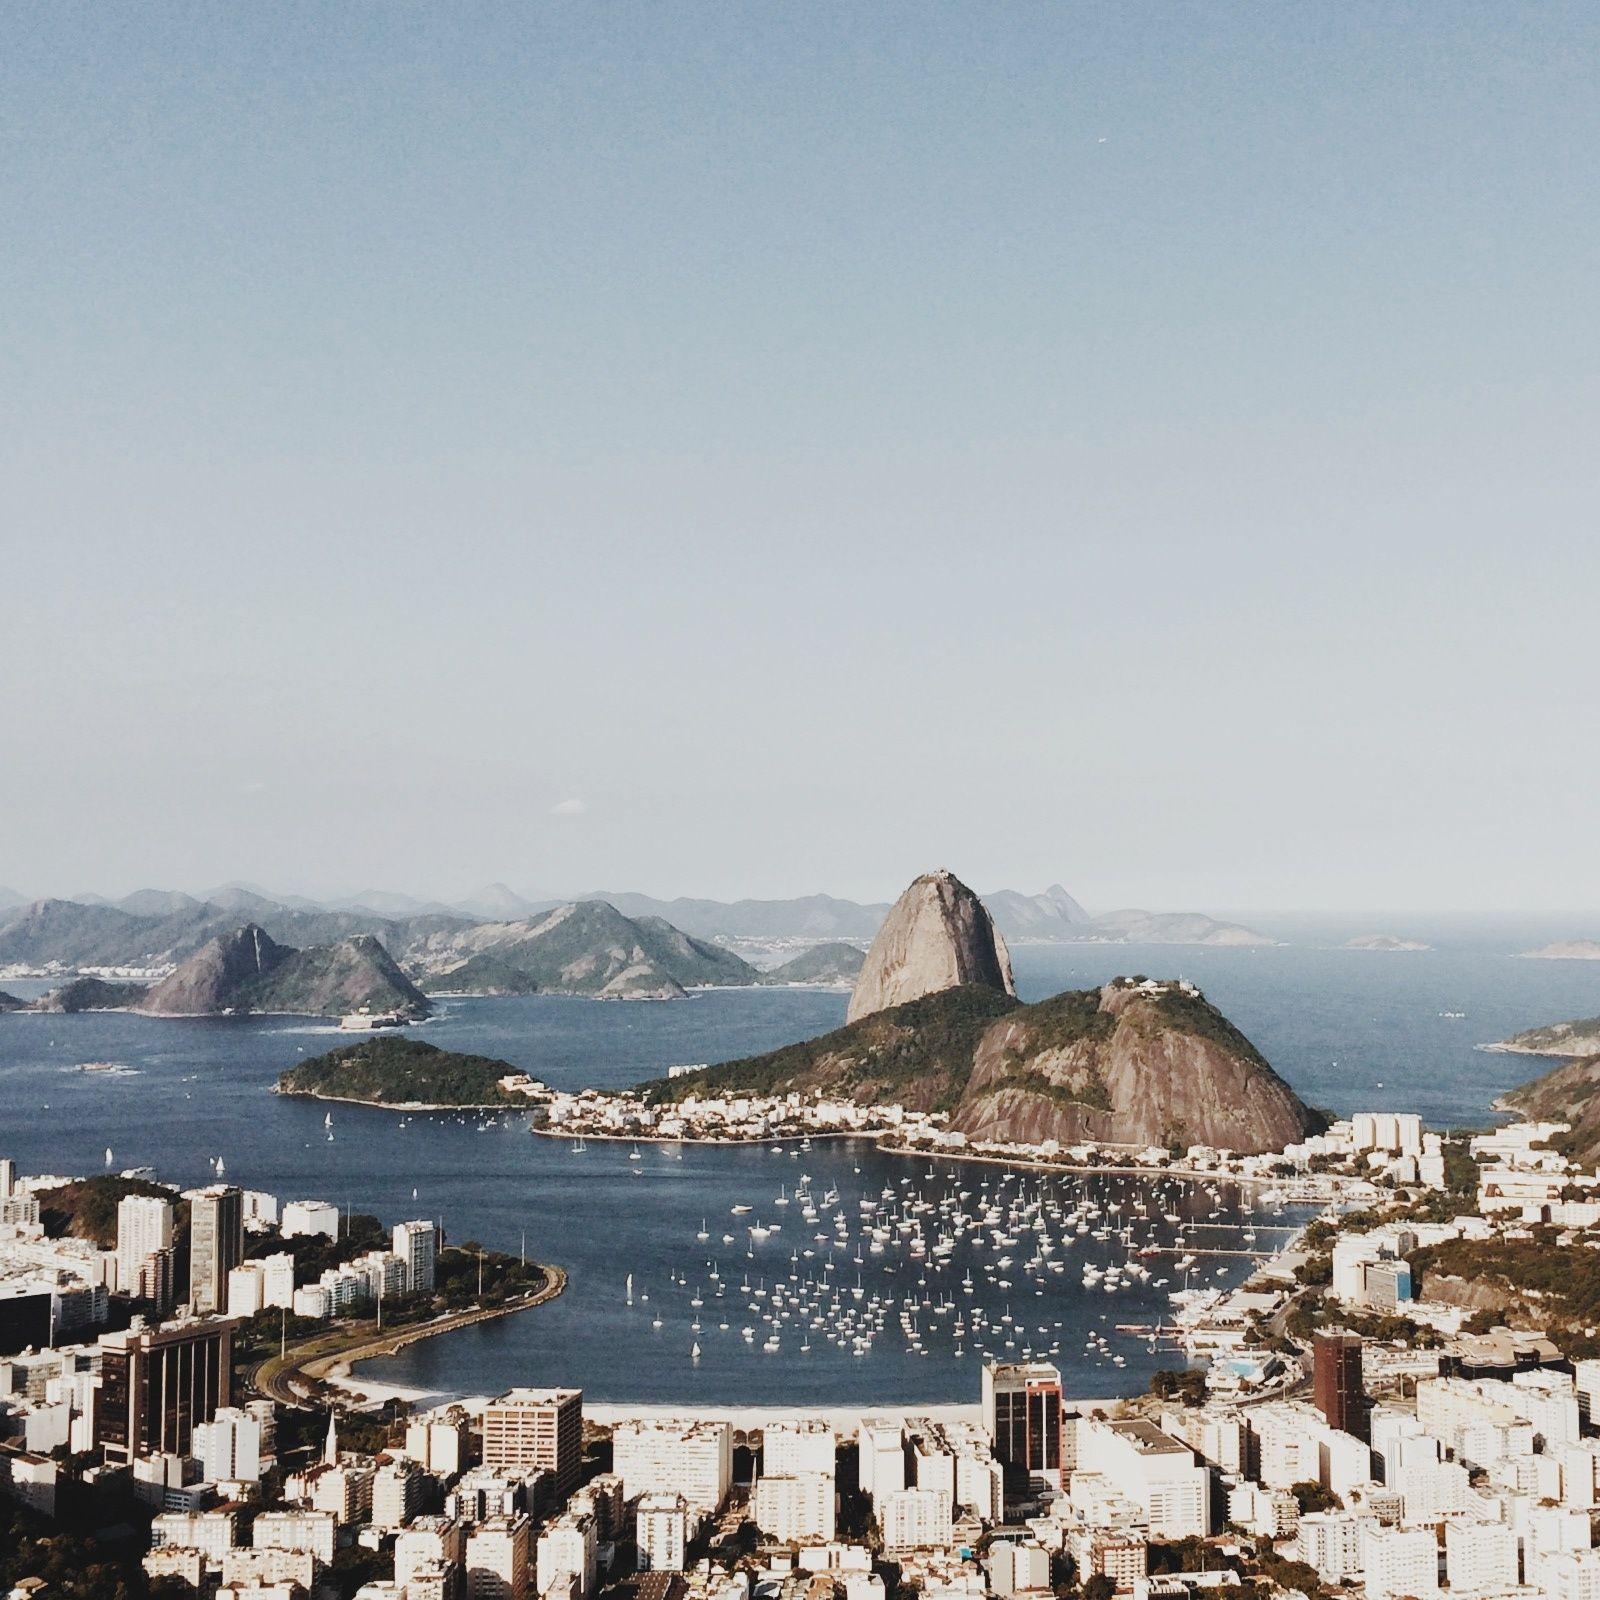 Rio de Janeiro #Worldendeavors #changeyourworld http://worldendeavors.com/destinations/americas/brazil